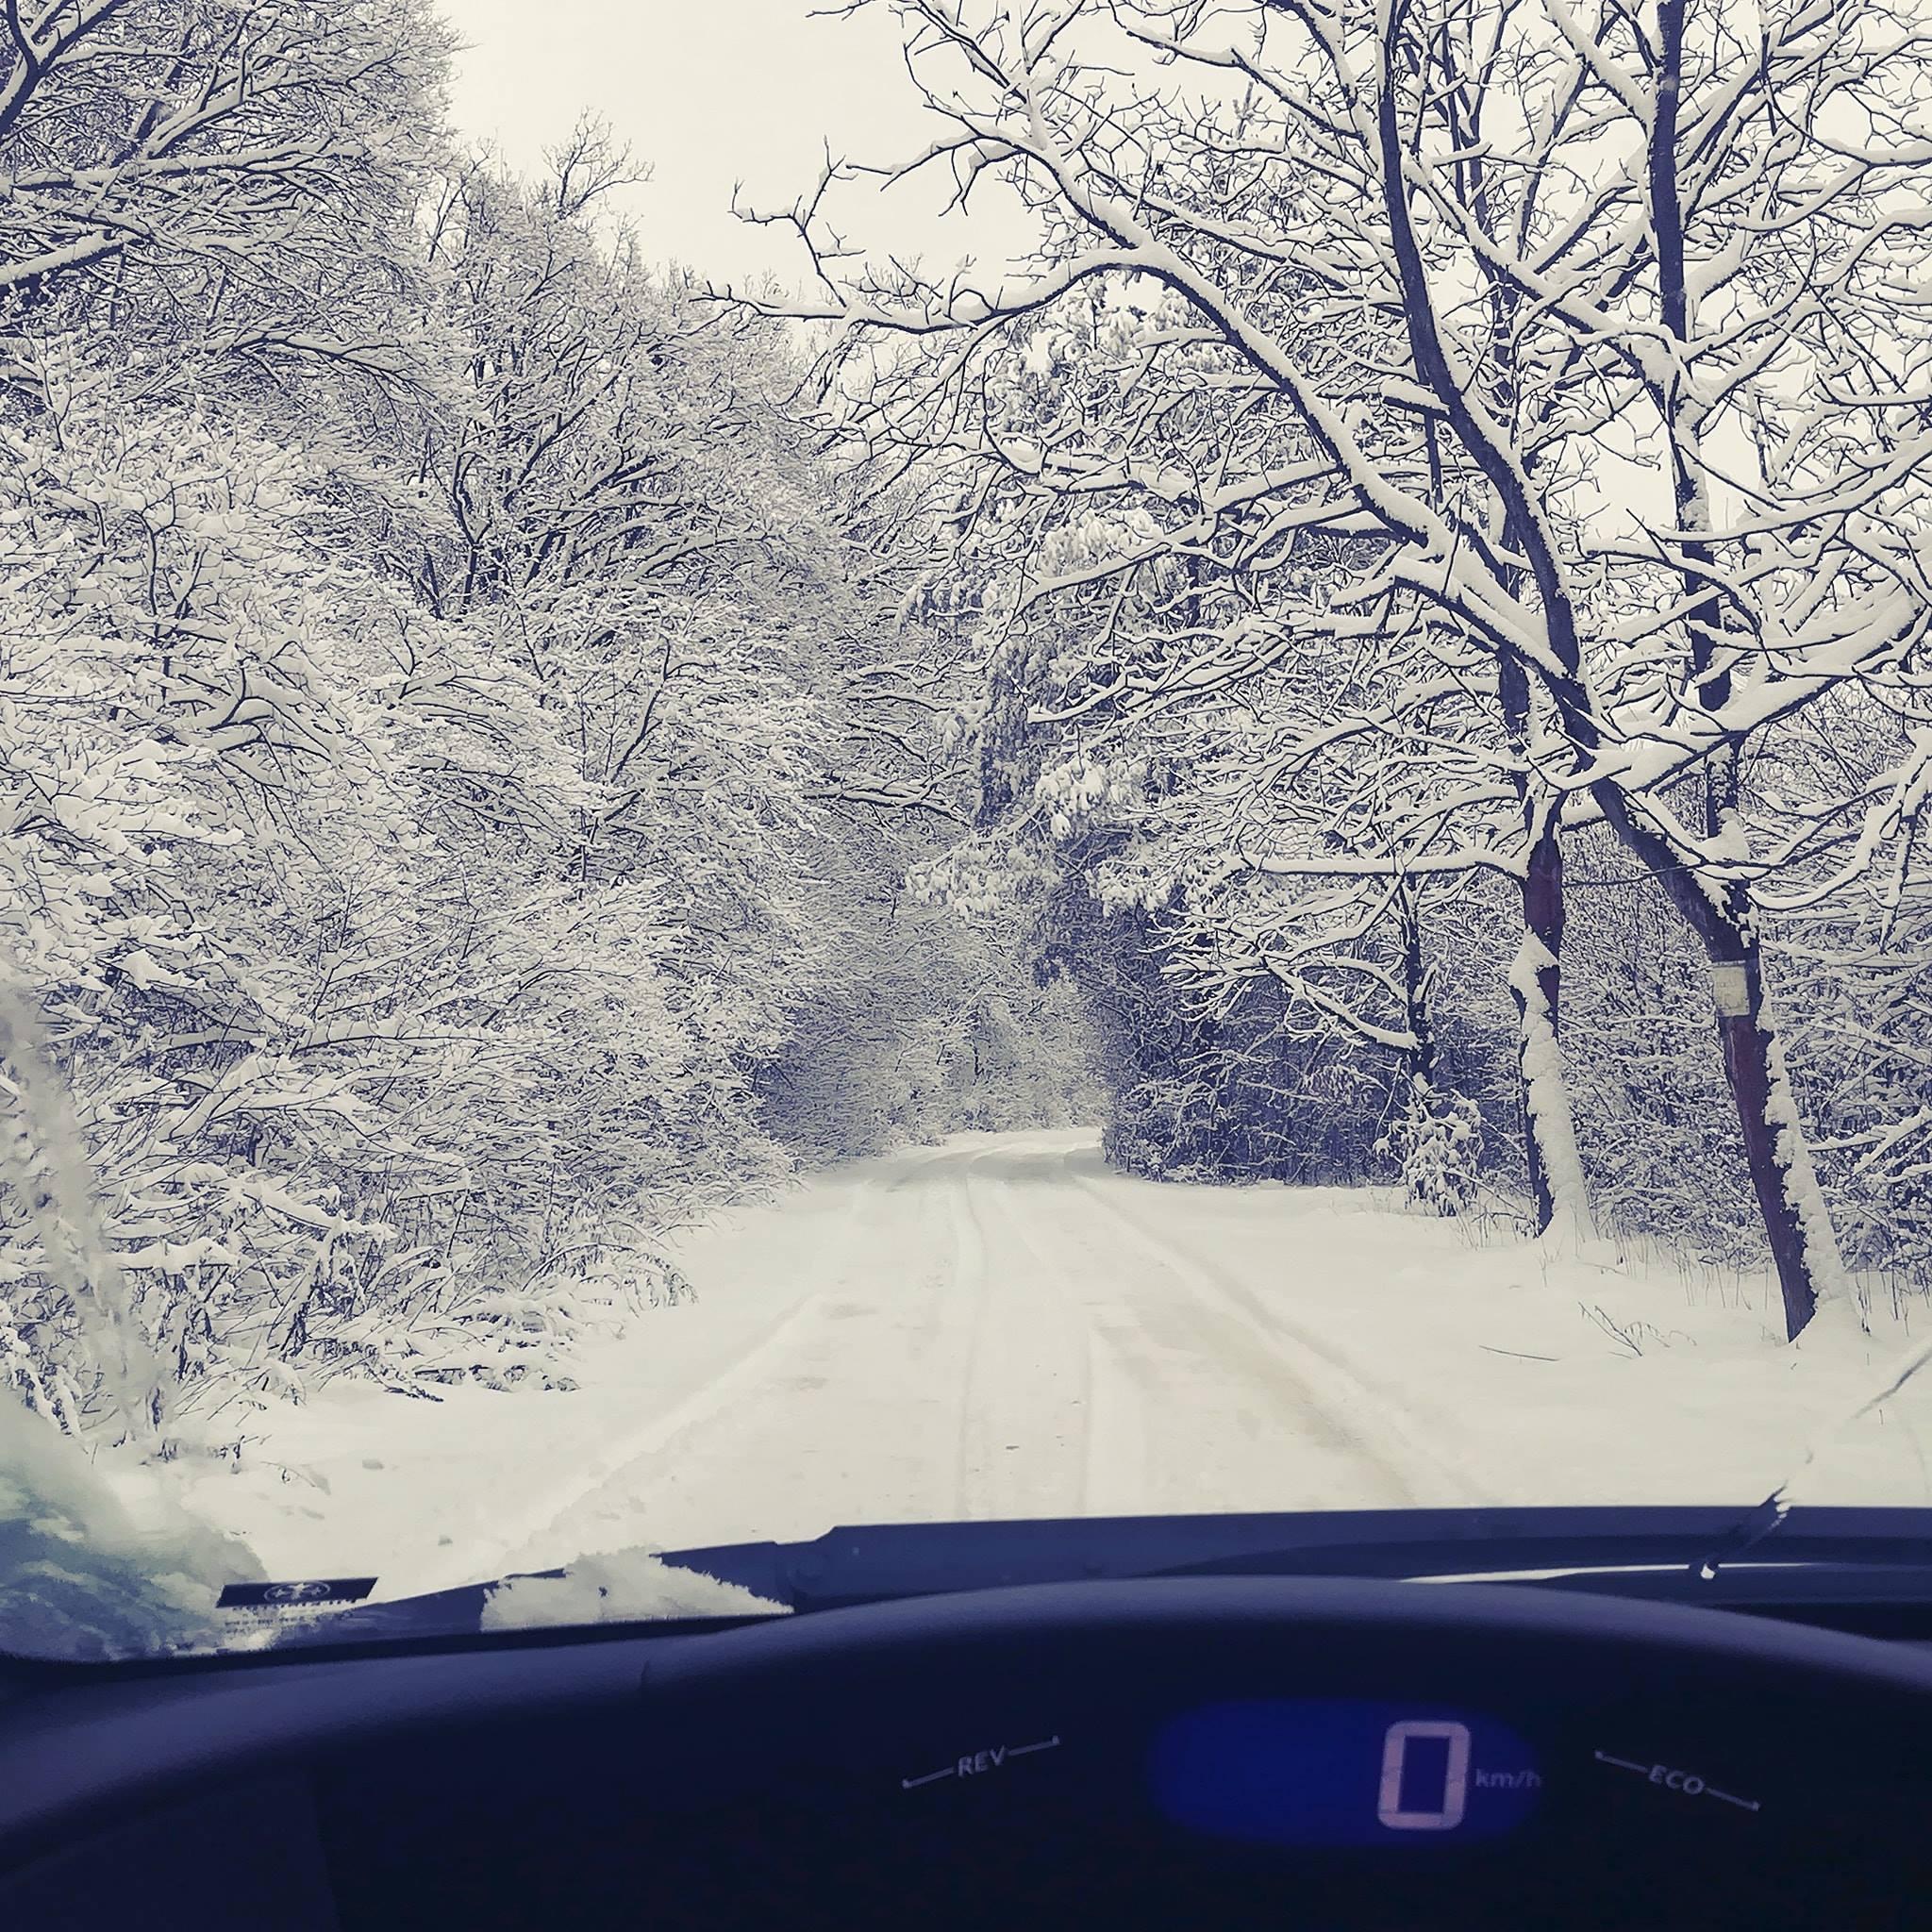 Téli szünet | Orienta.hu